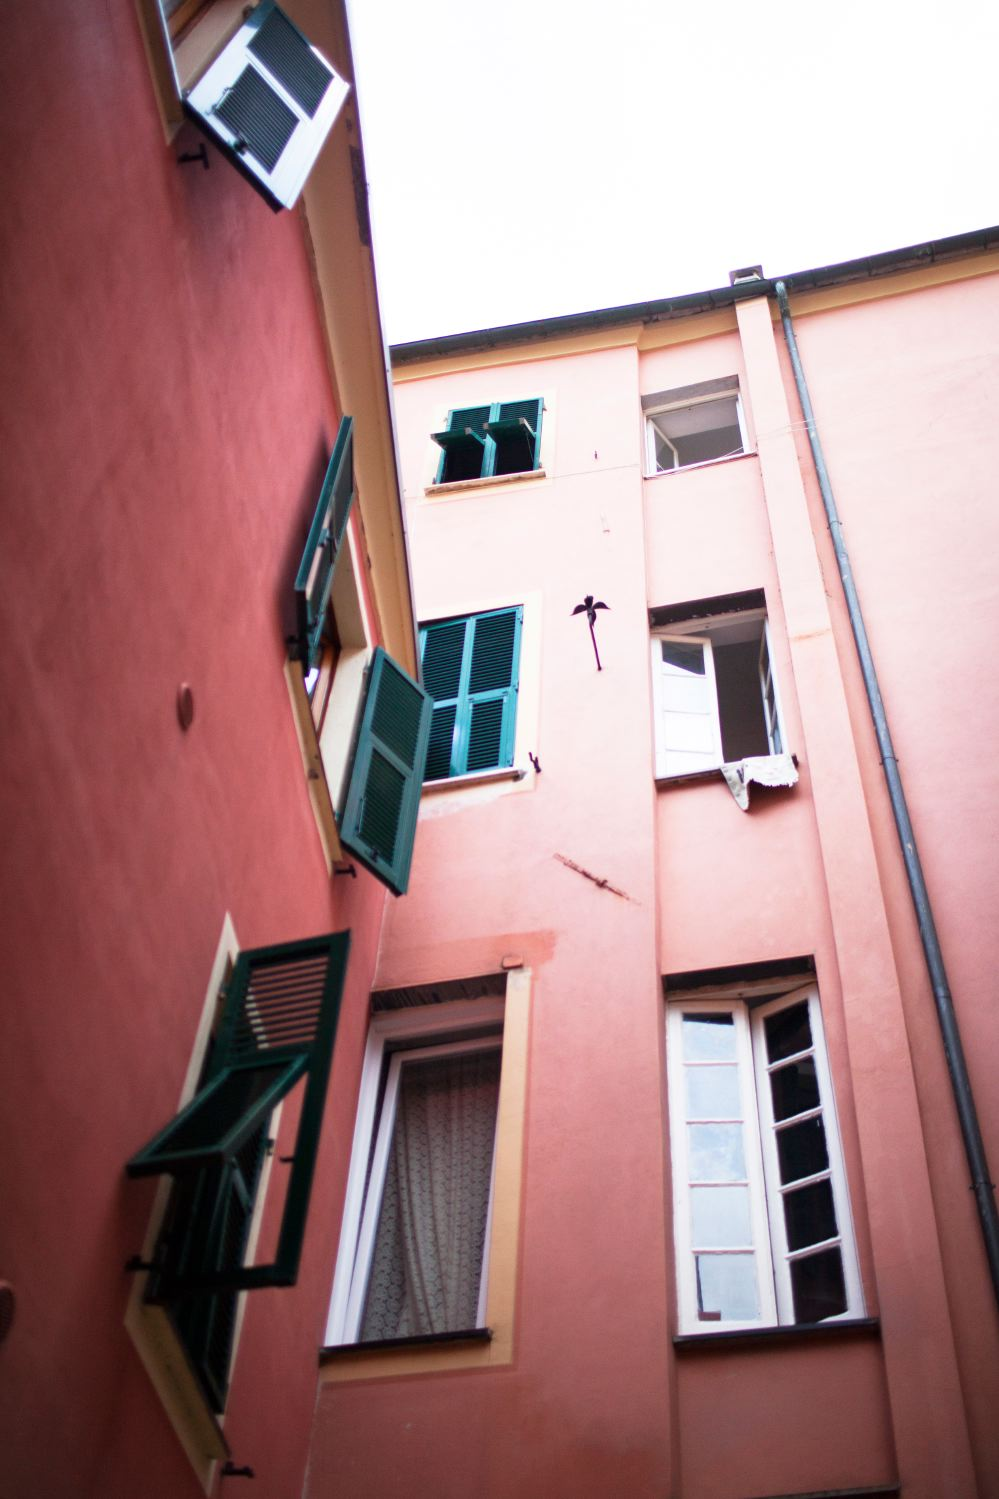 You've Got Flair | Travel | Viareggio | 037.JPG